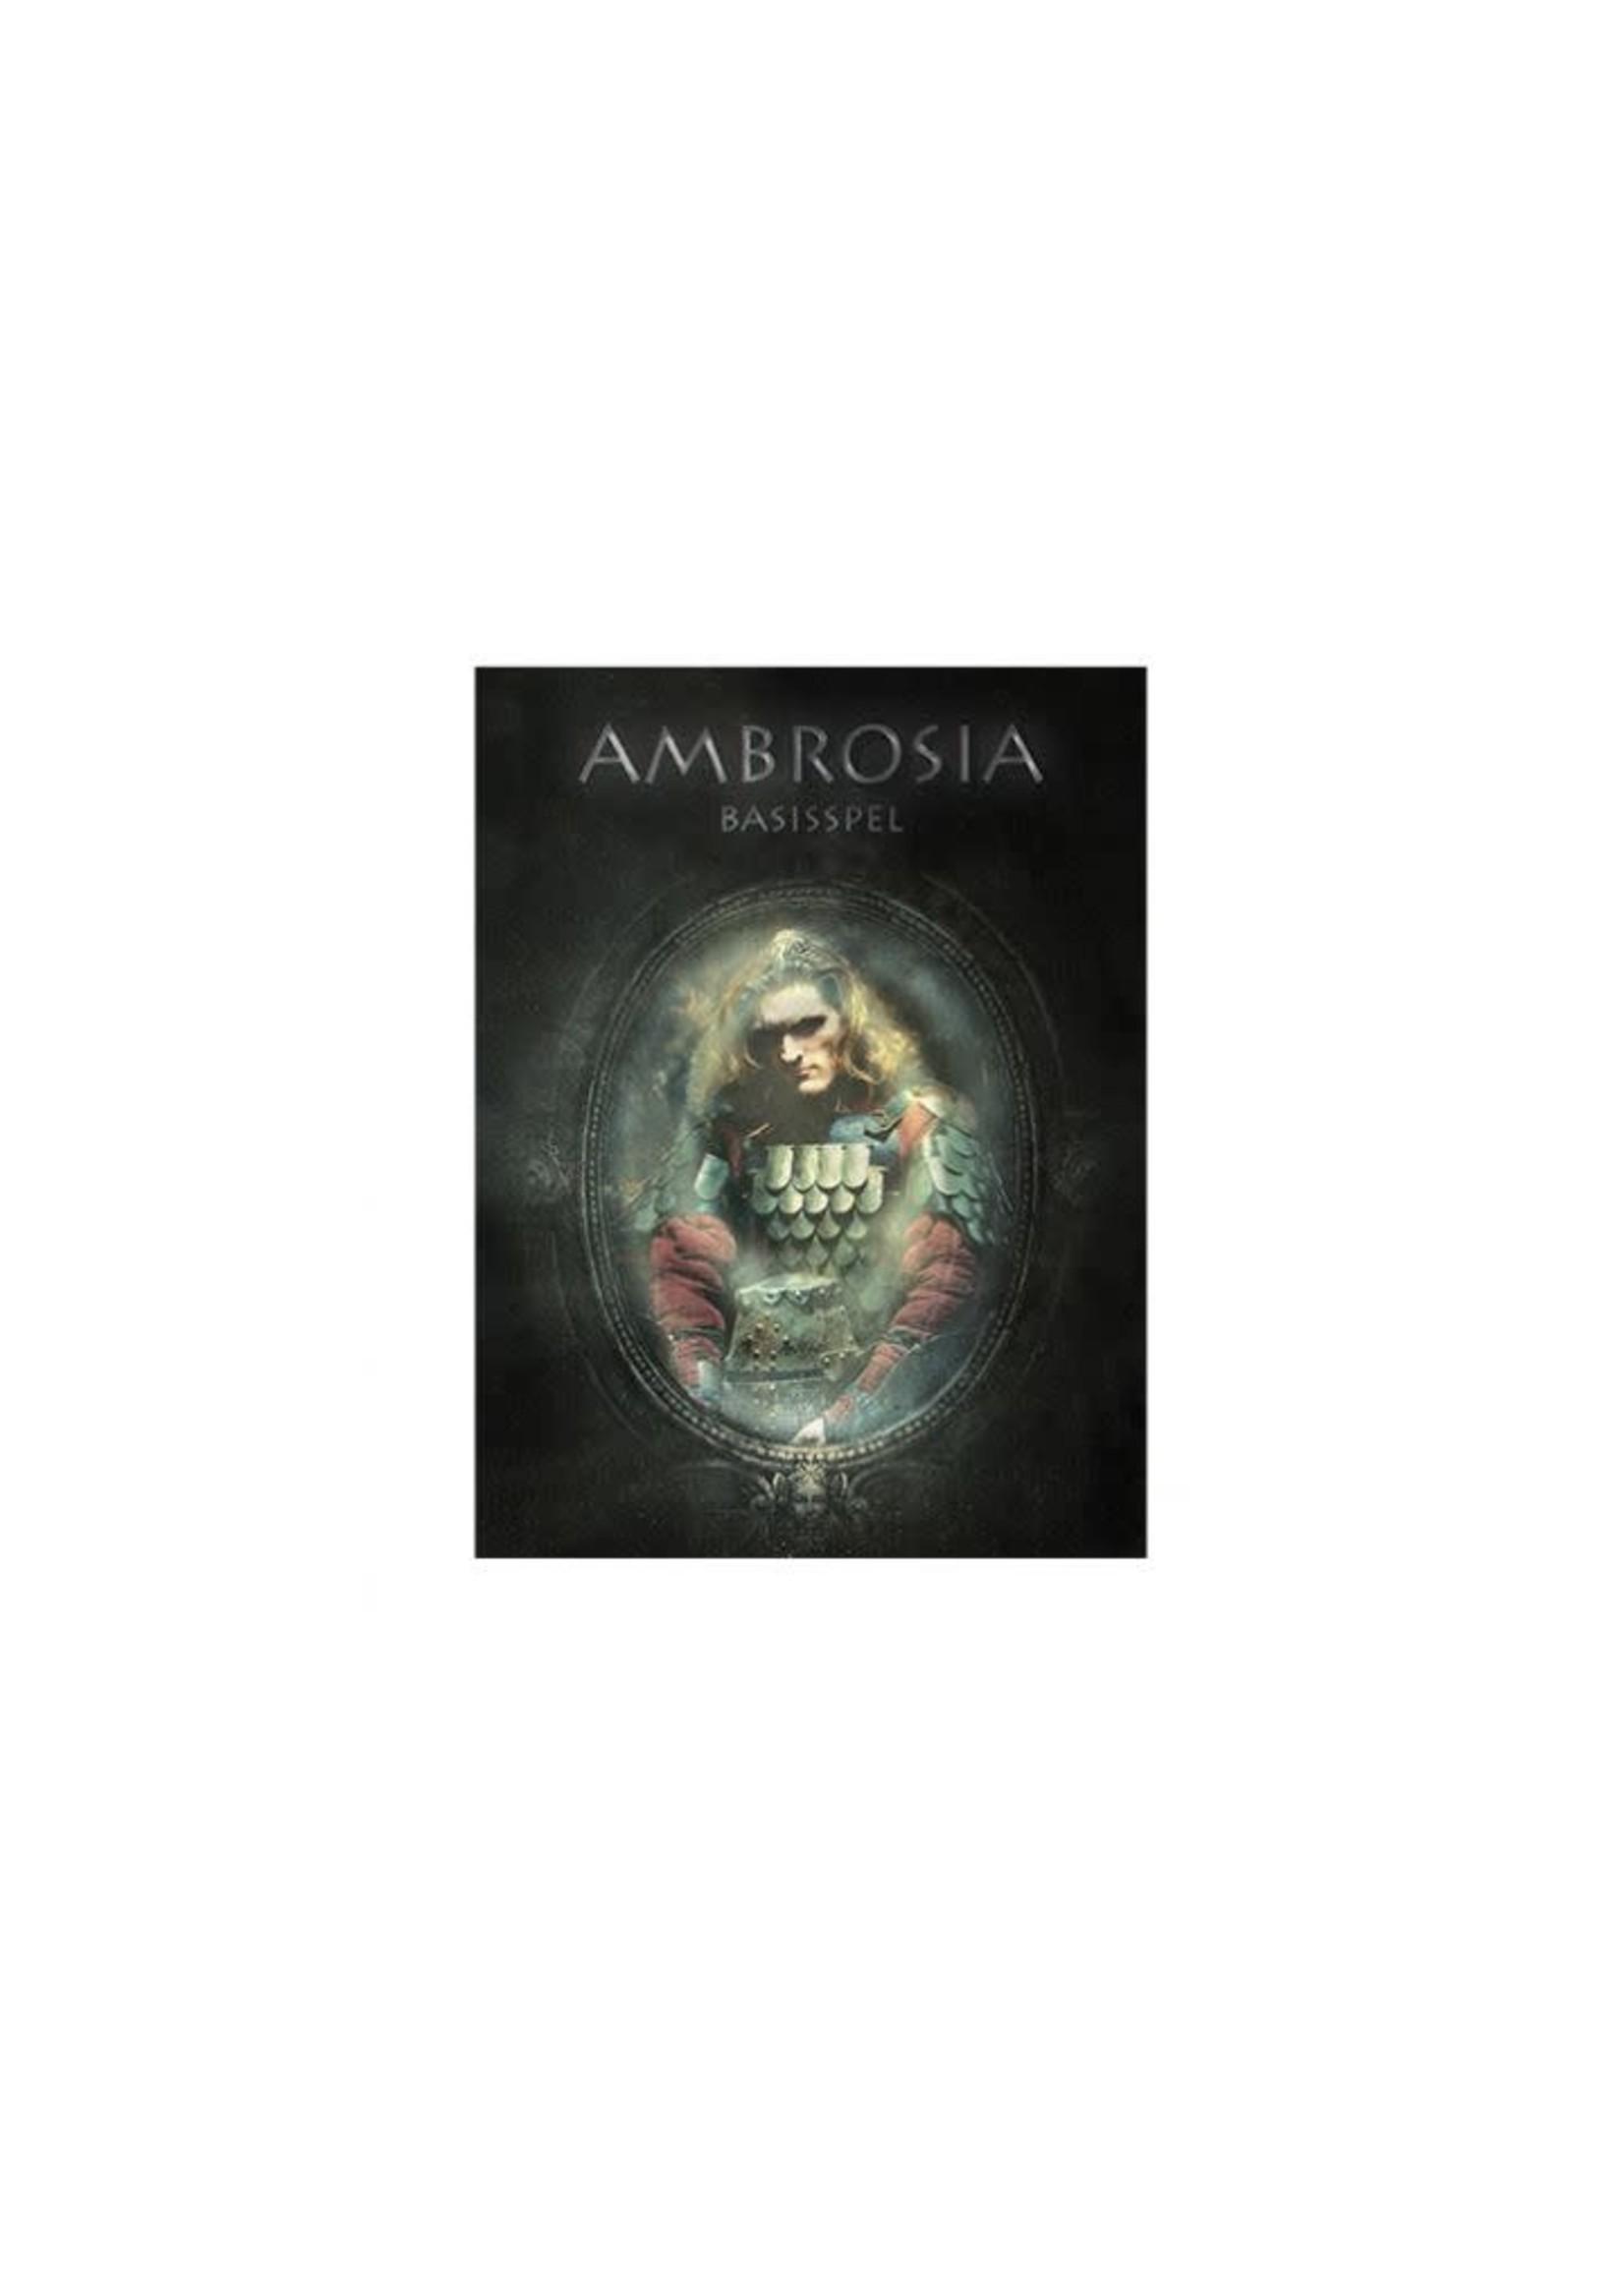 Ambrosia Bassispel